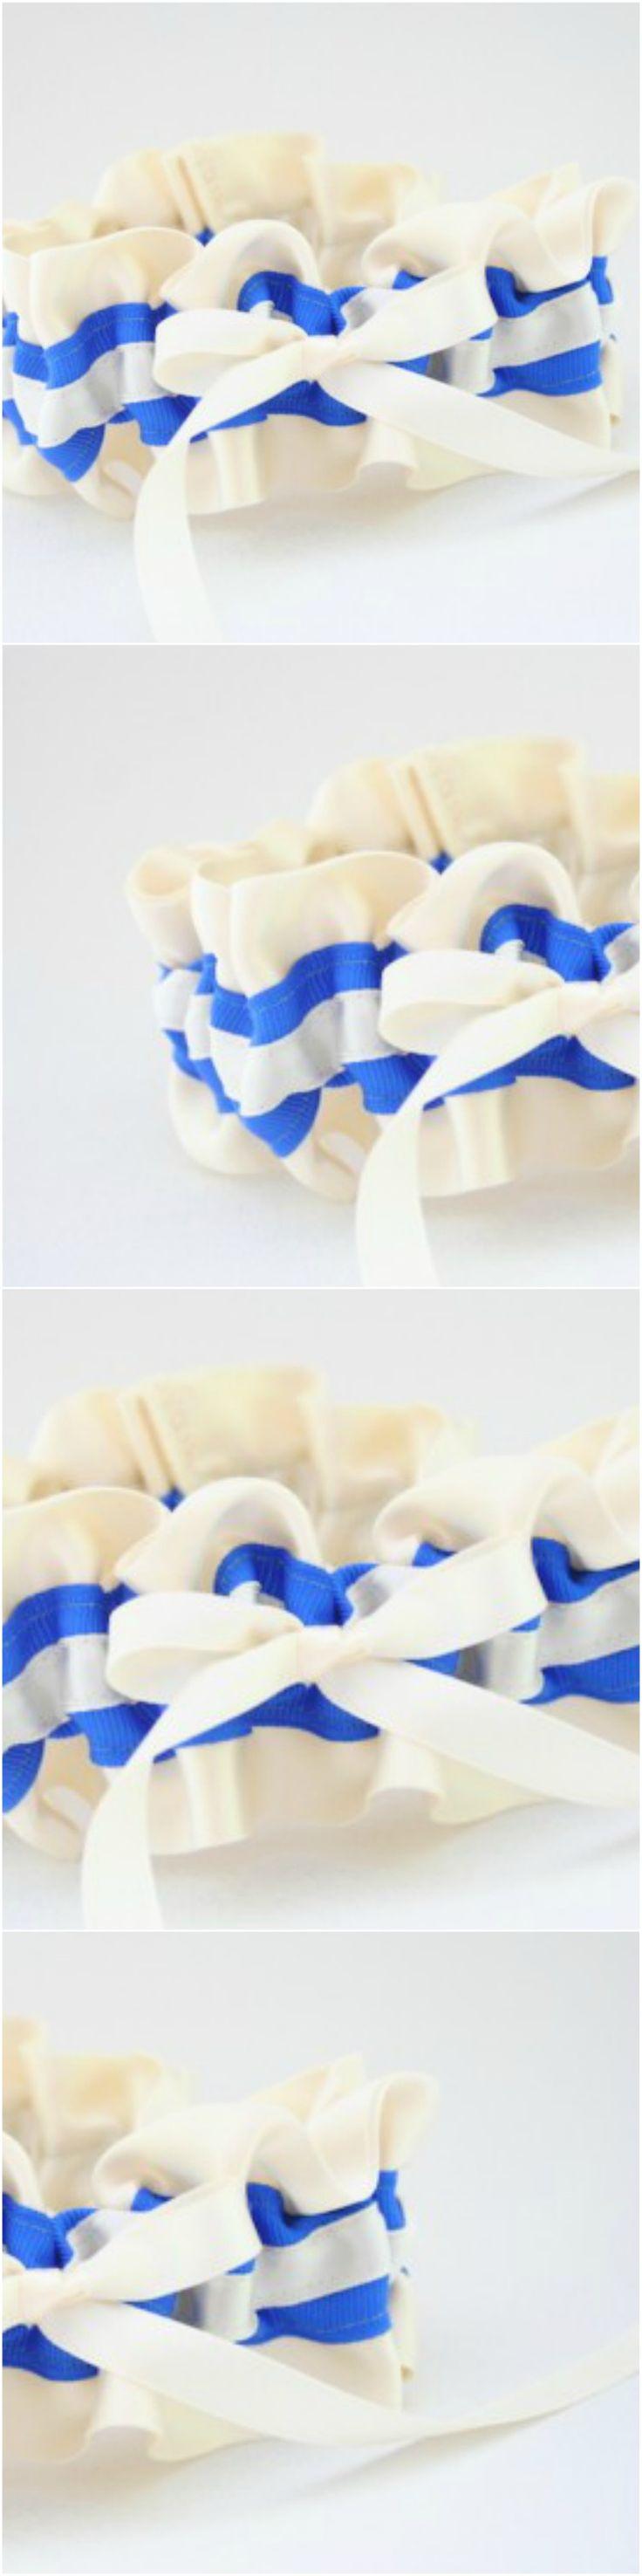 Custom Ivory and Bright Blue wedding garter-by The Garter Girl